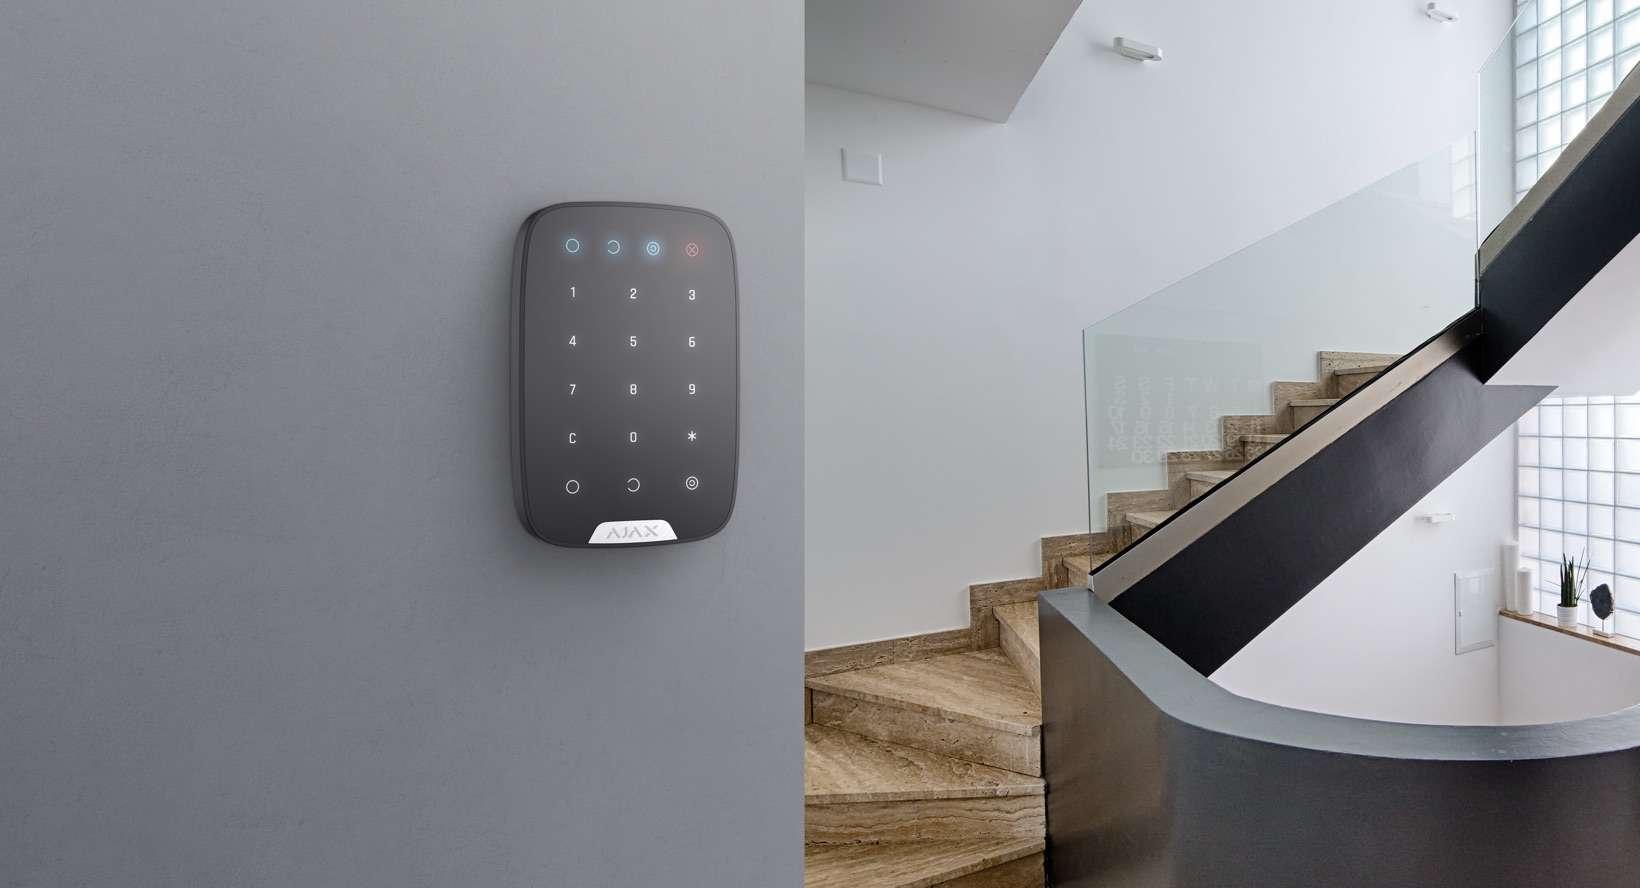 alarmsysteem installatie